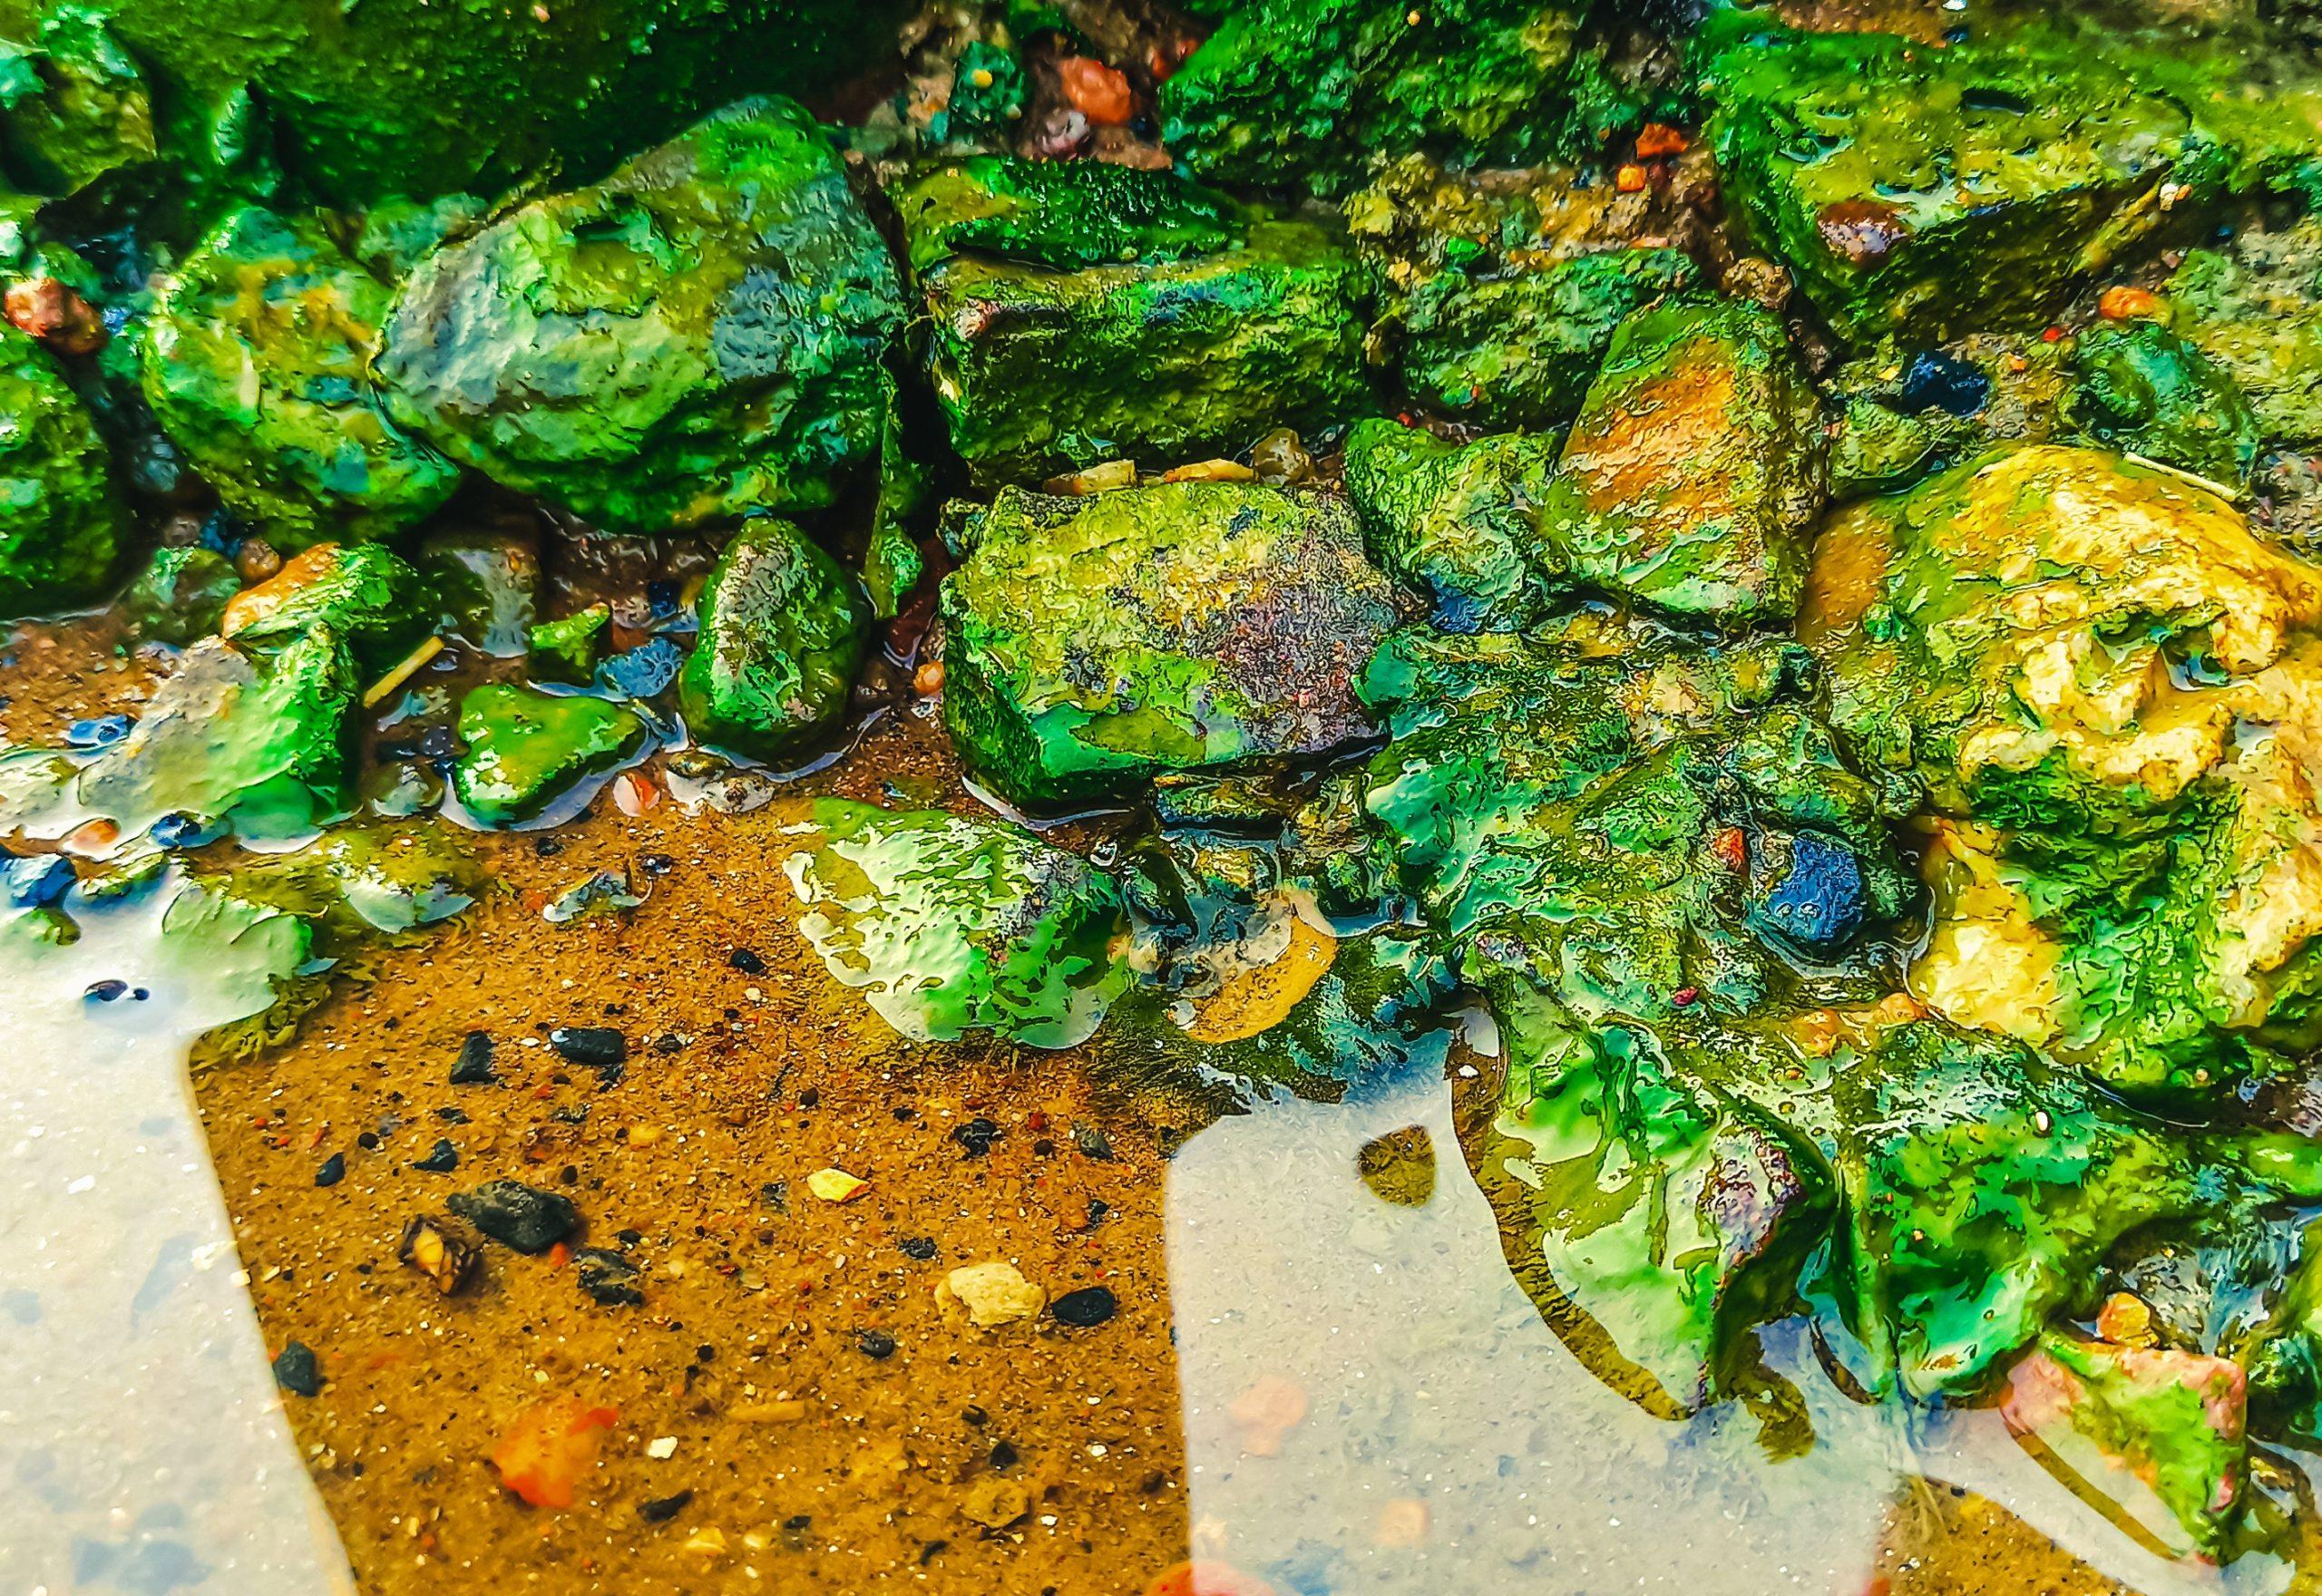 Wet rock stones near a pond